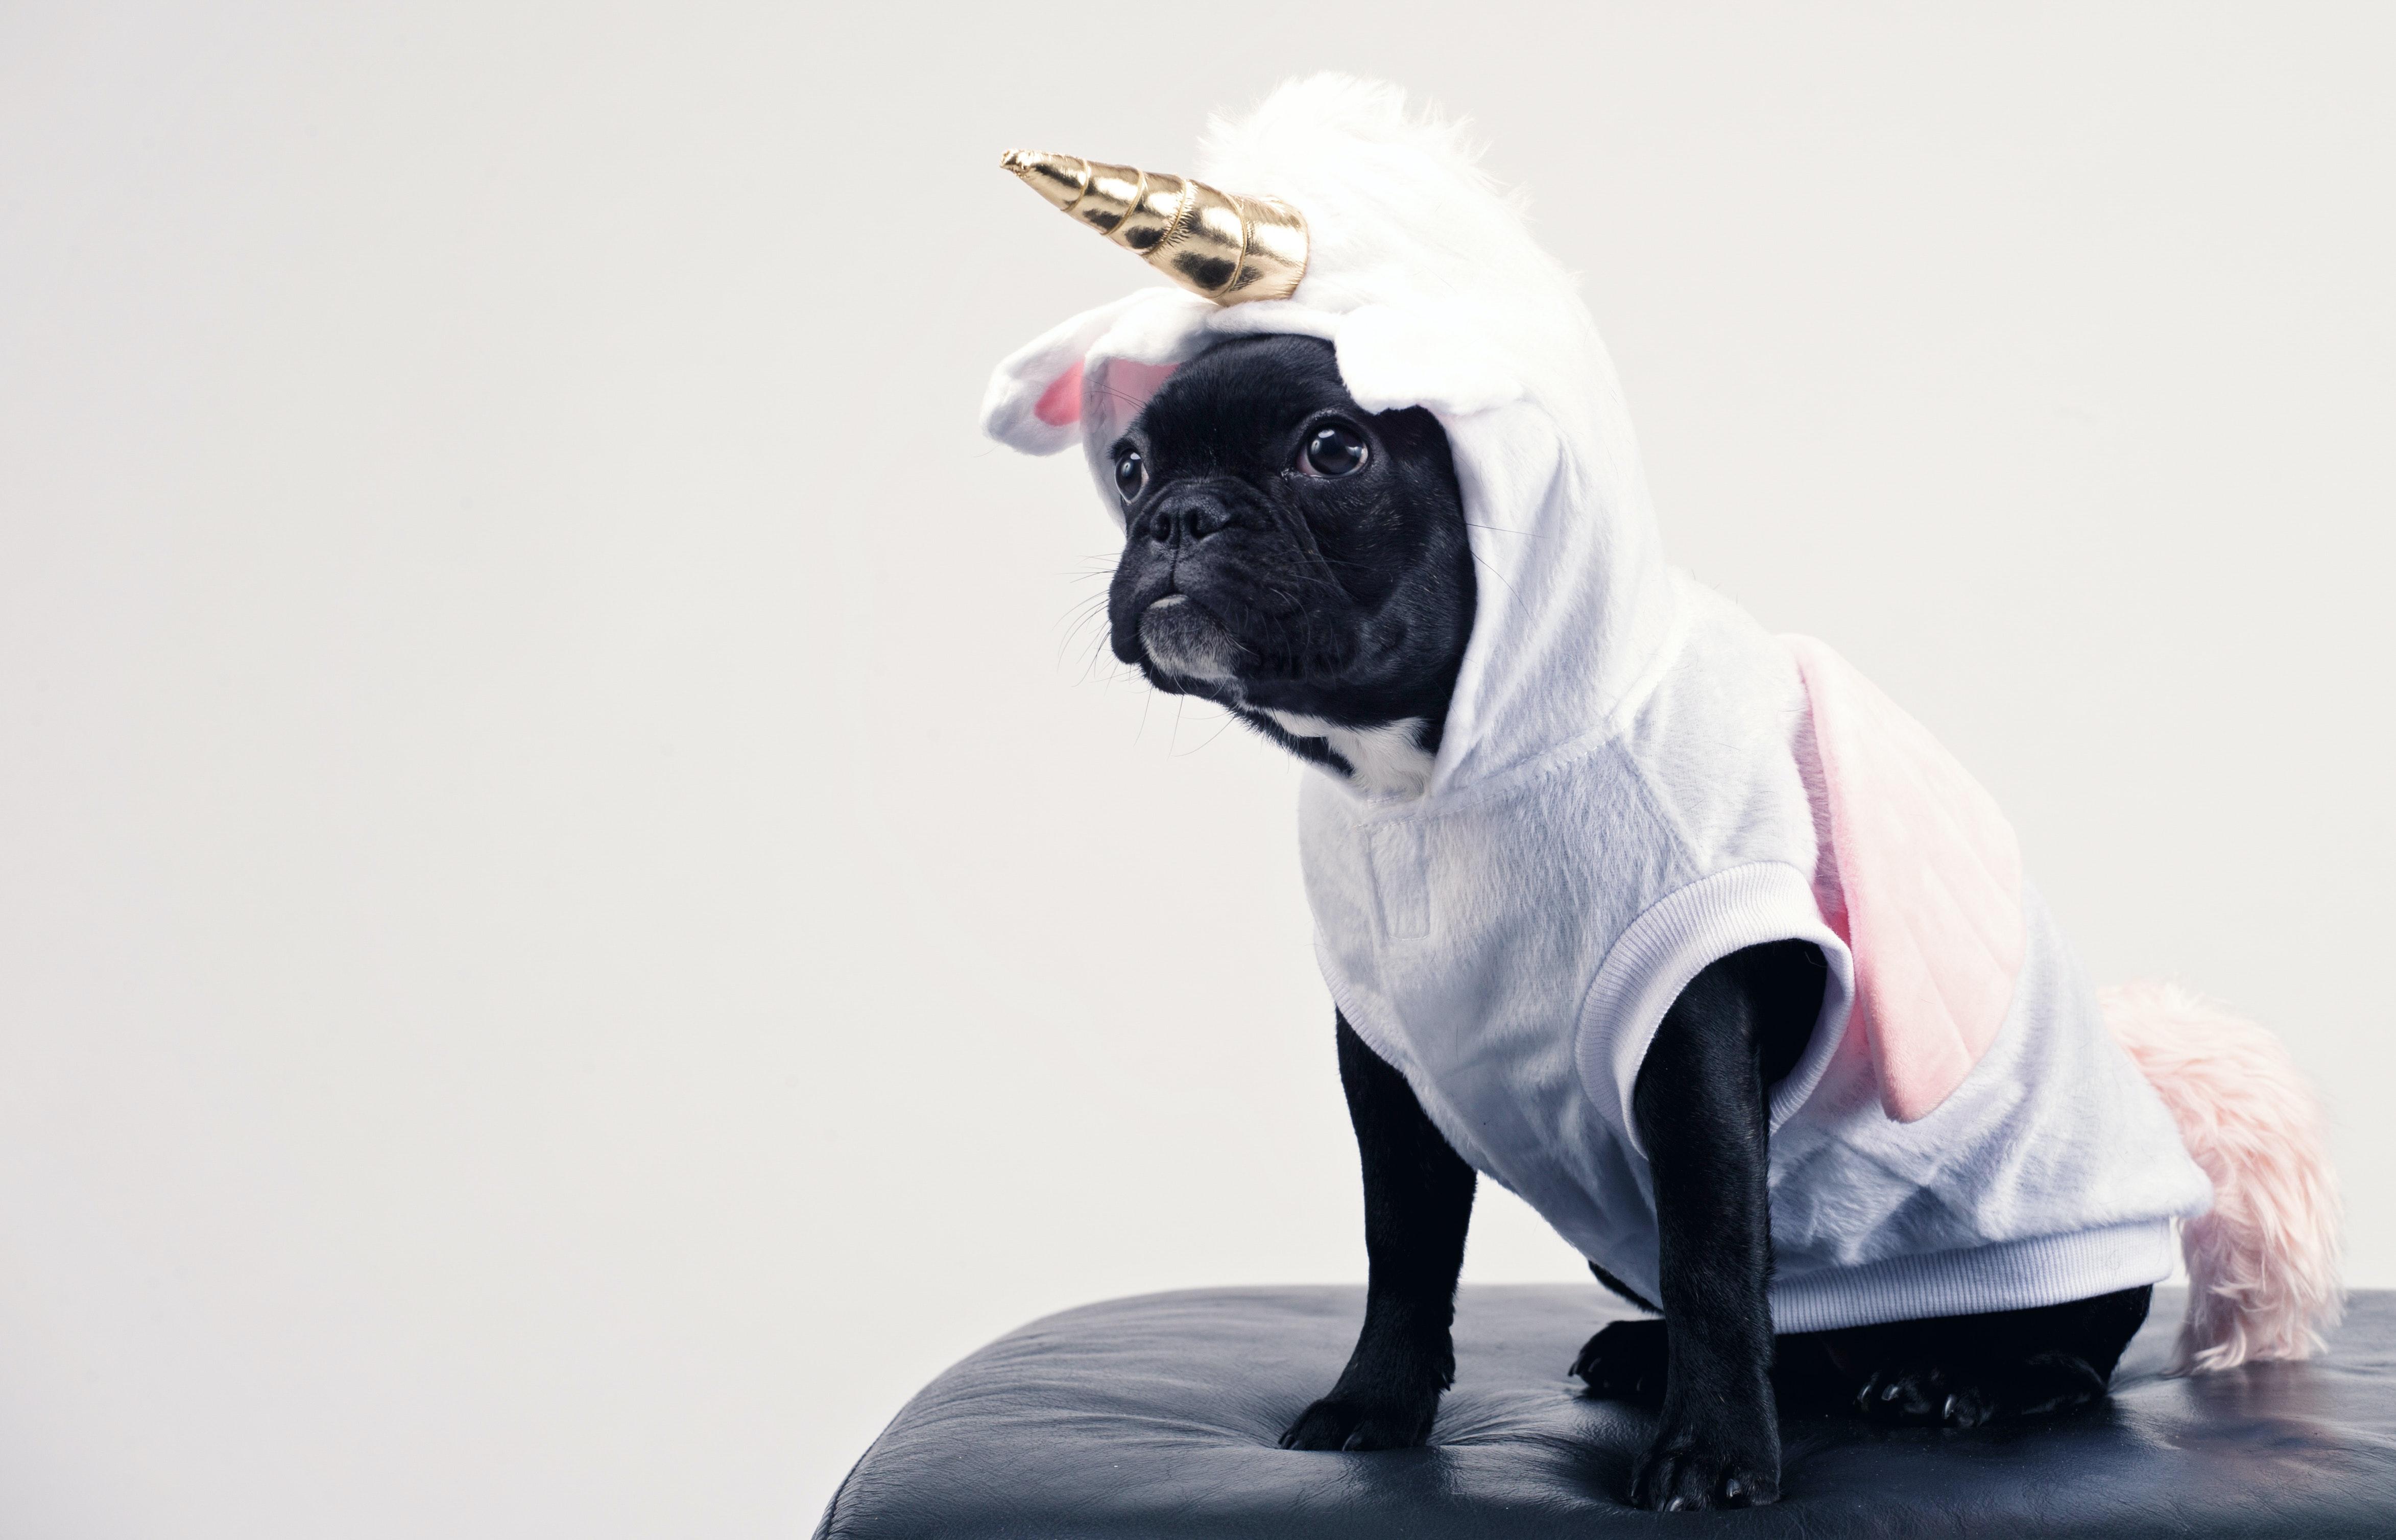 114634b9e3b Boston Terrier Wearing Unicorn Pet Costume · Free Stock Photo